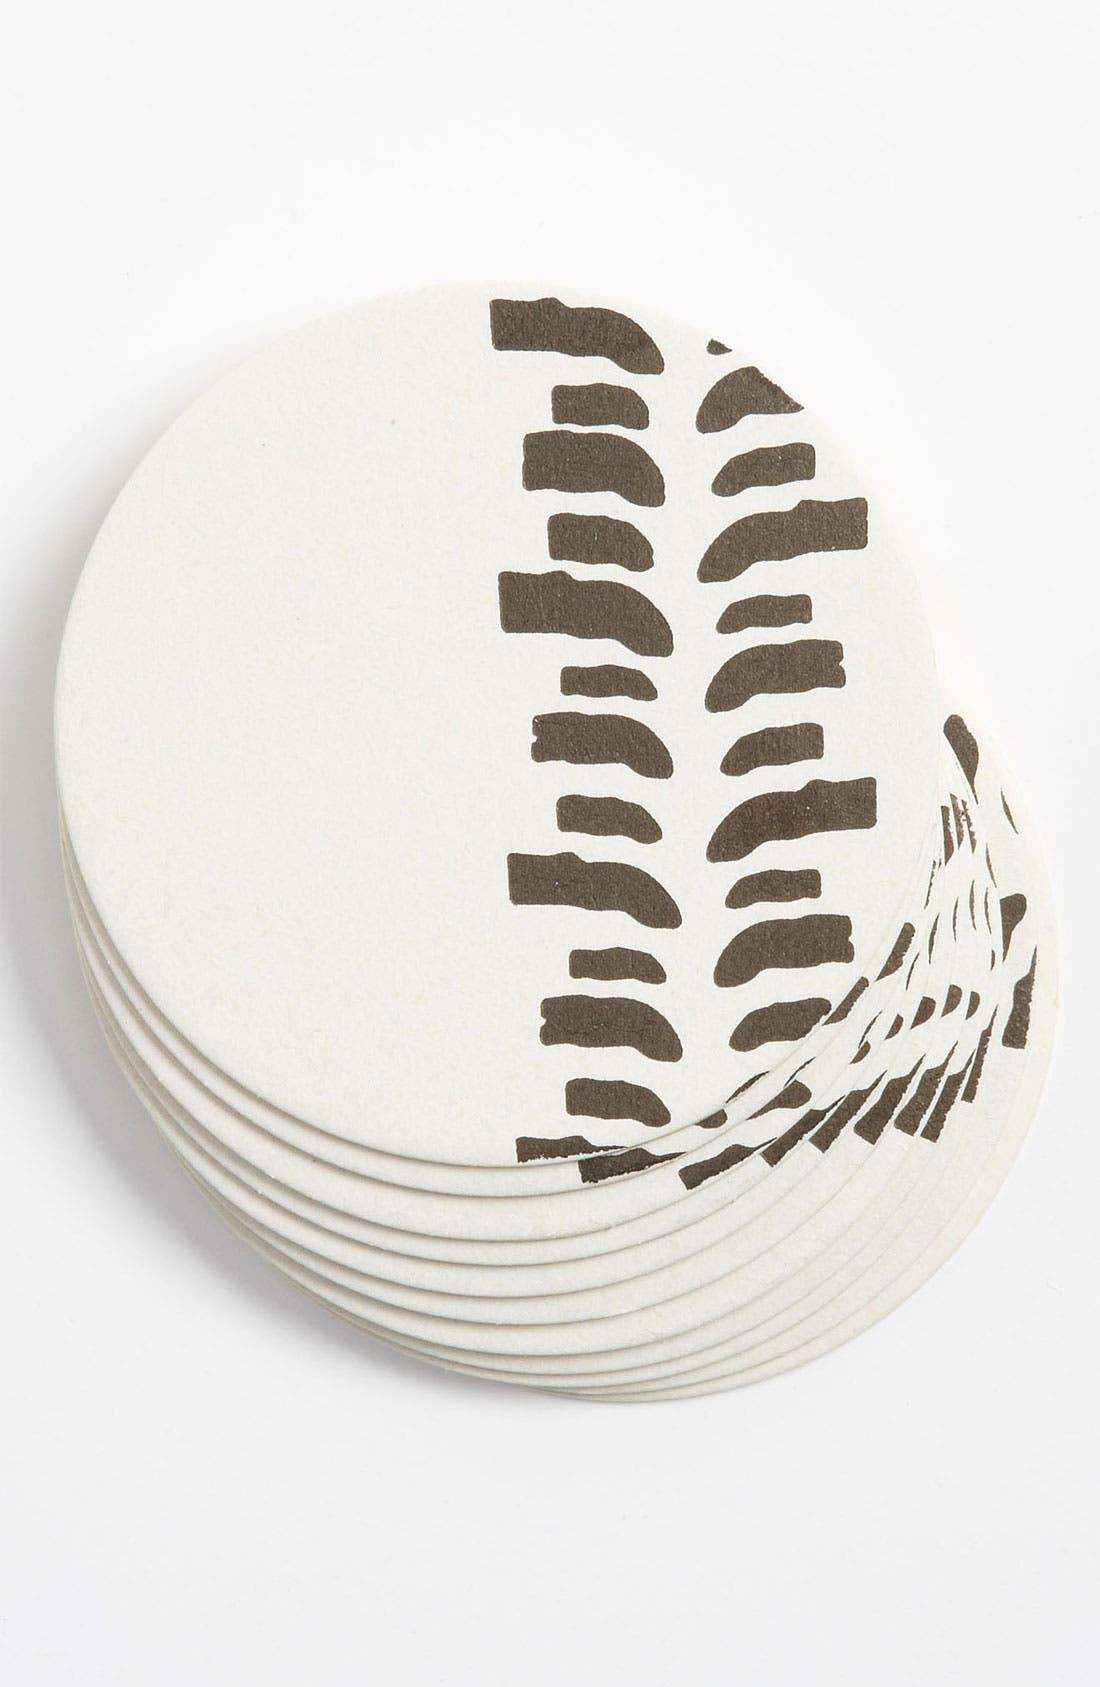 Alternate Image 1 Selected - 'Truck Tires' Letterpress Coasters (Set of 10)